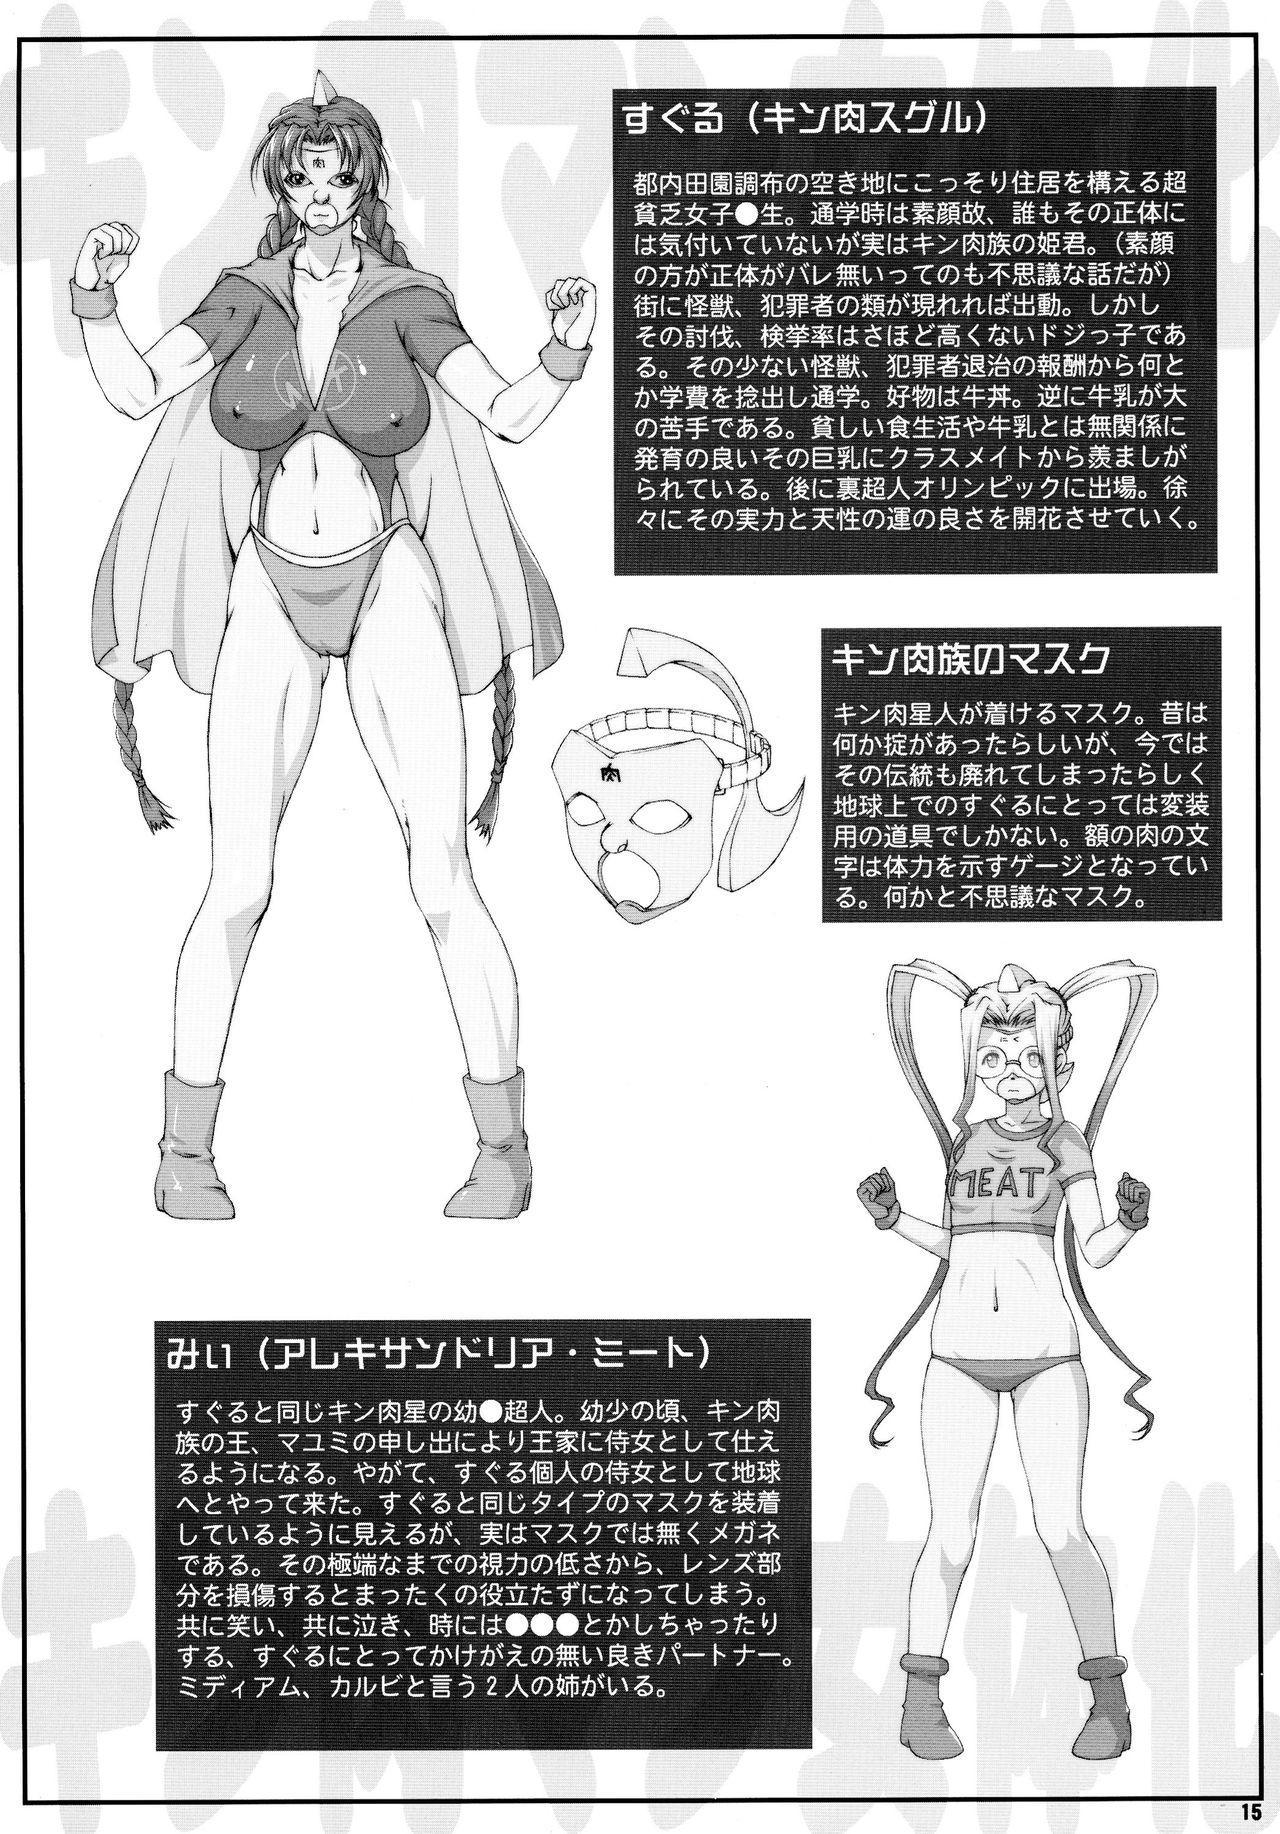 Misoka no 5 14